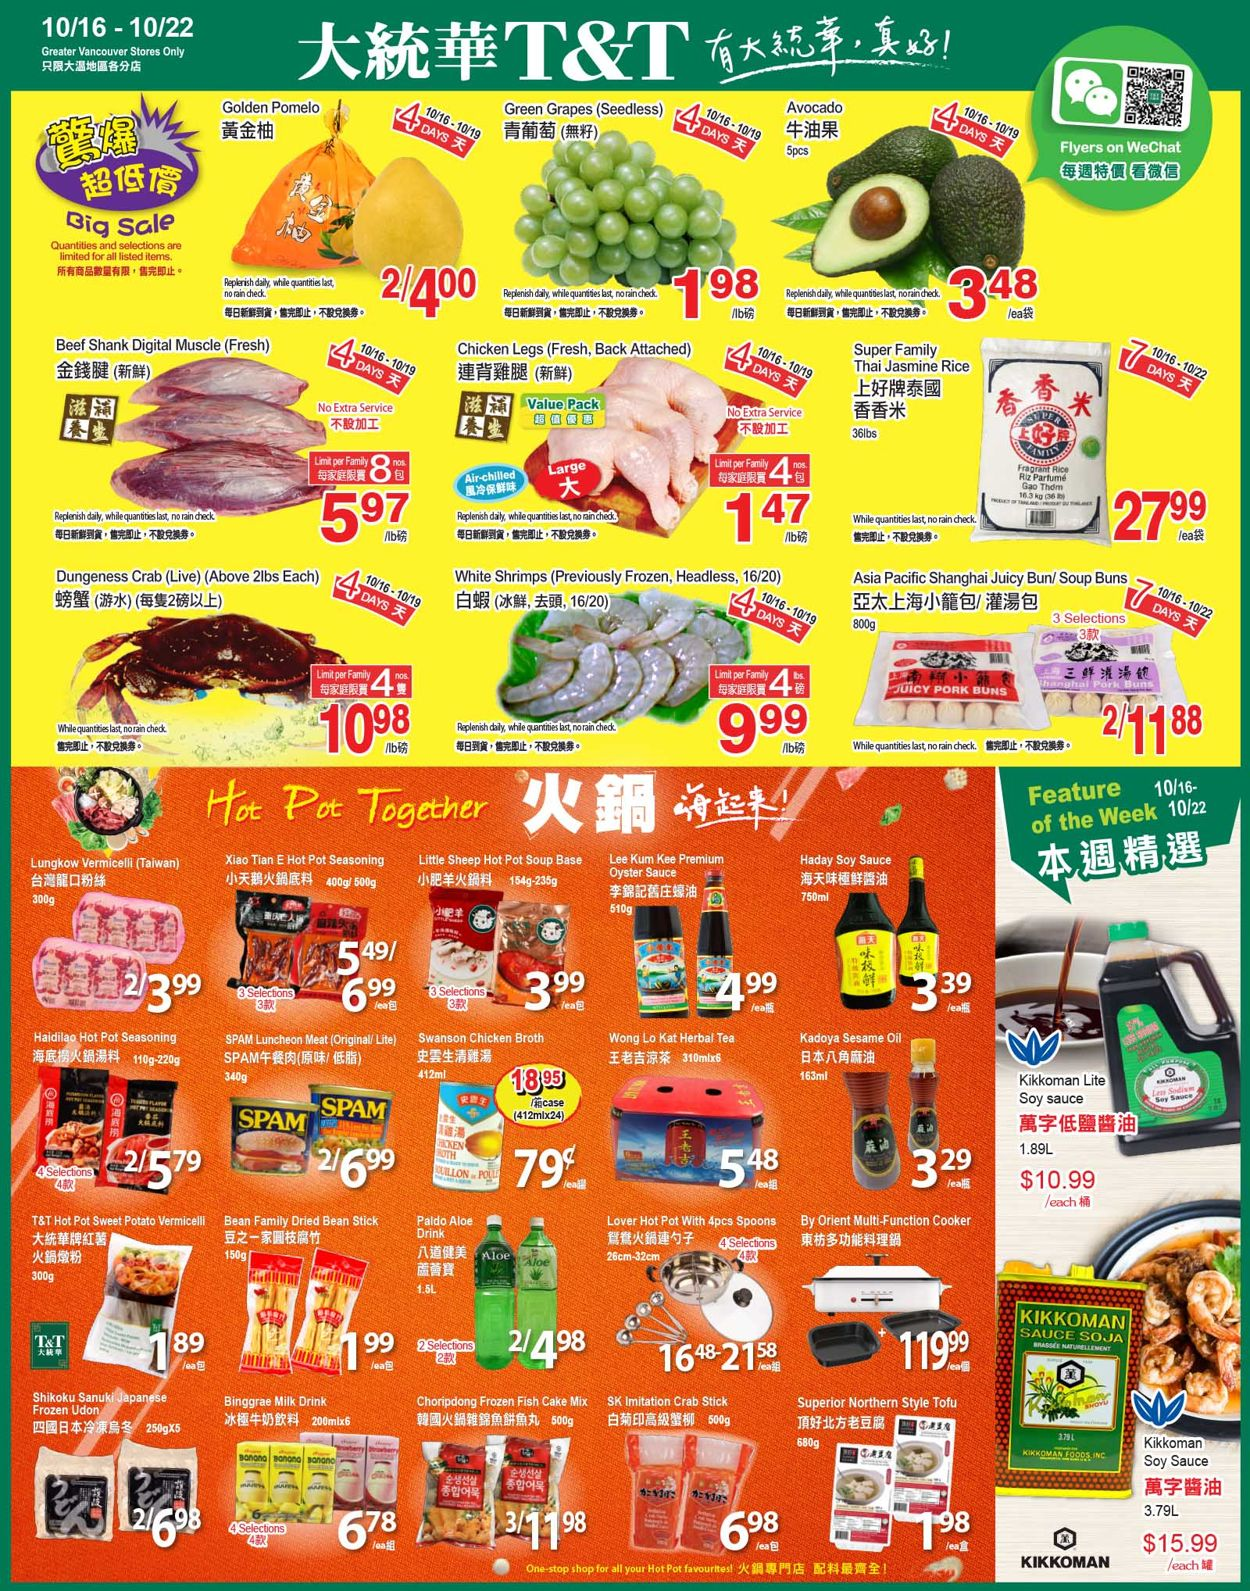 T&T Supermarket Flyer - 10/16-10/22/2020